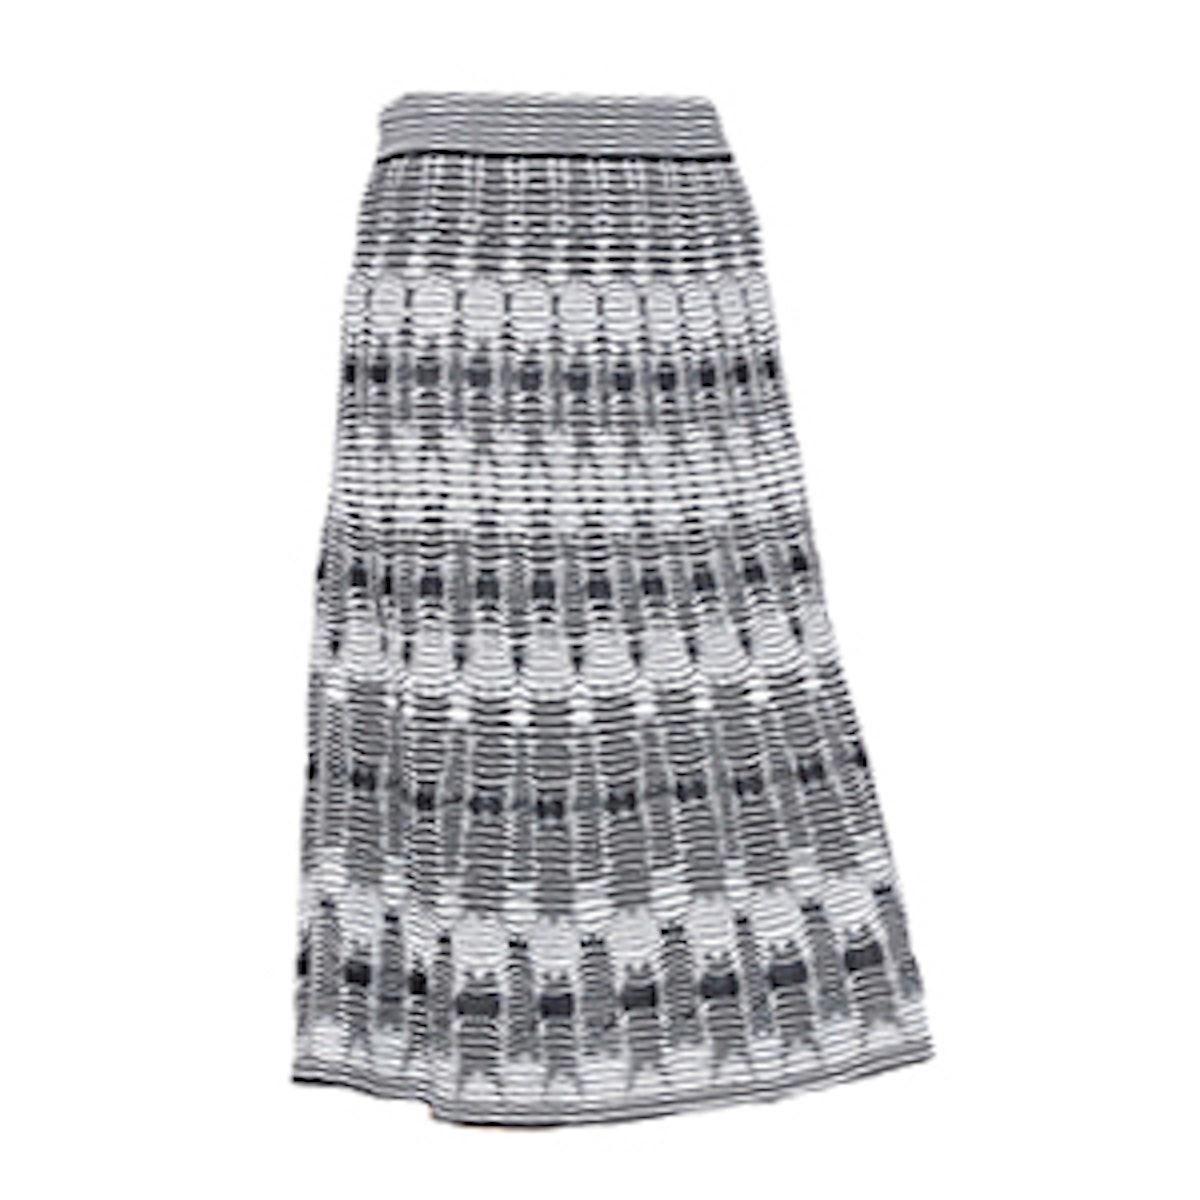 Tie-Dye Knit Midi Skirt